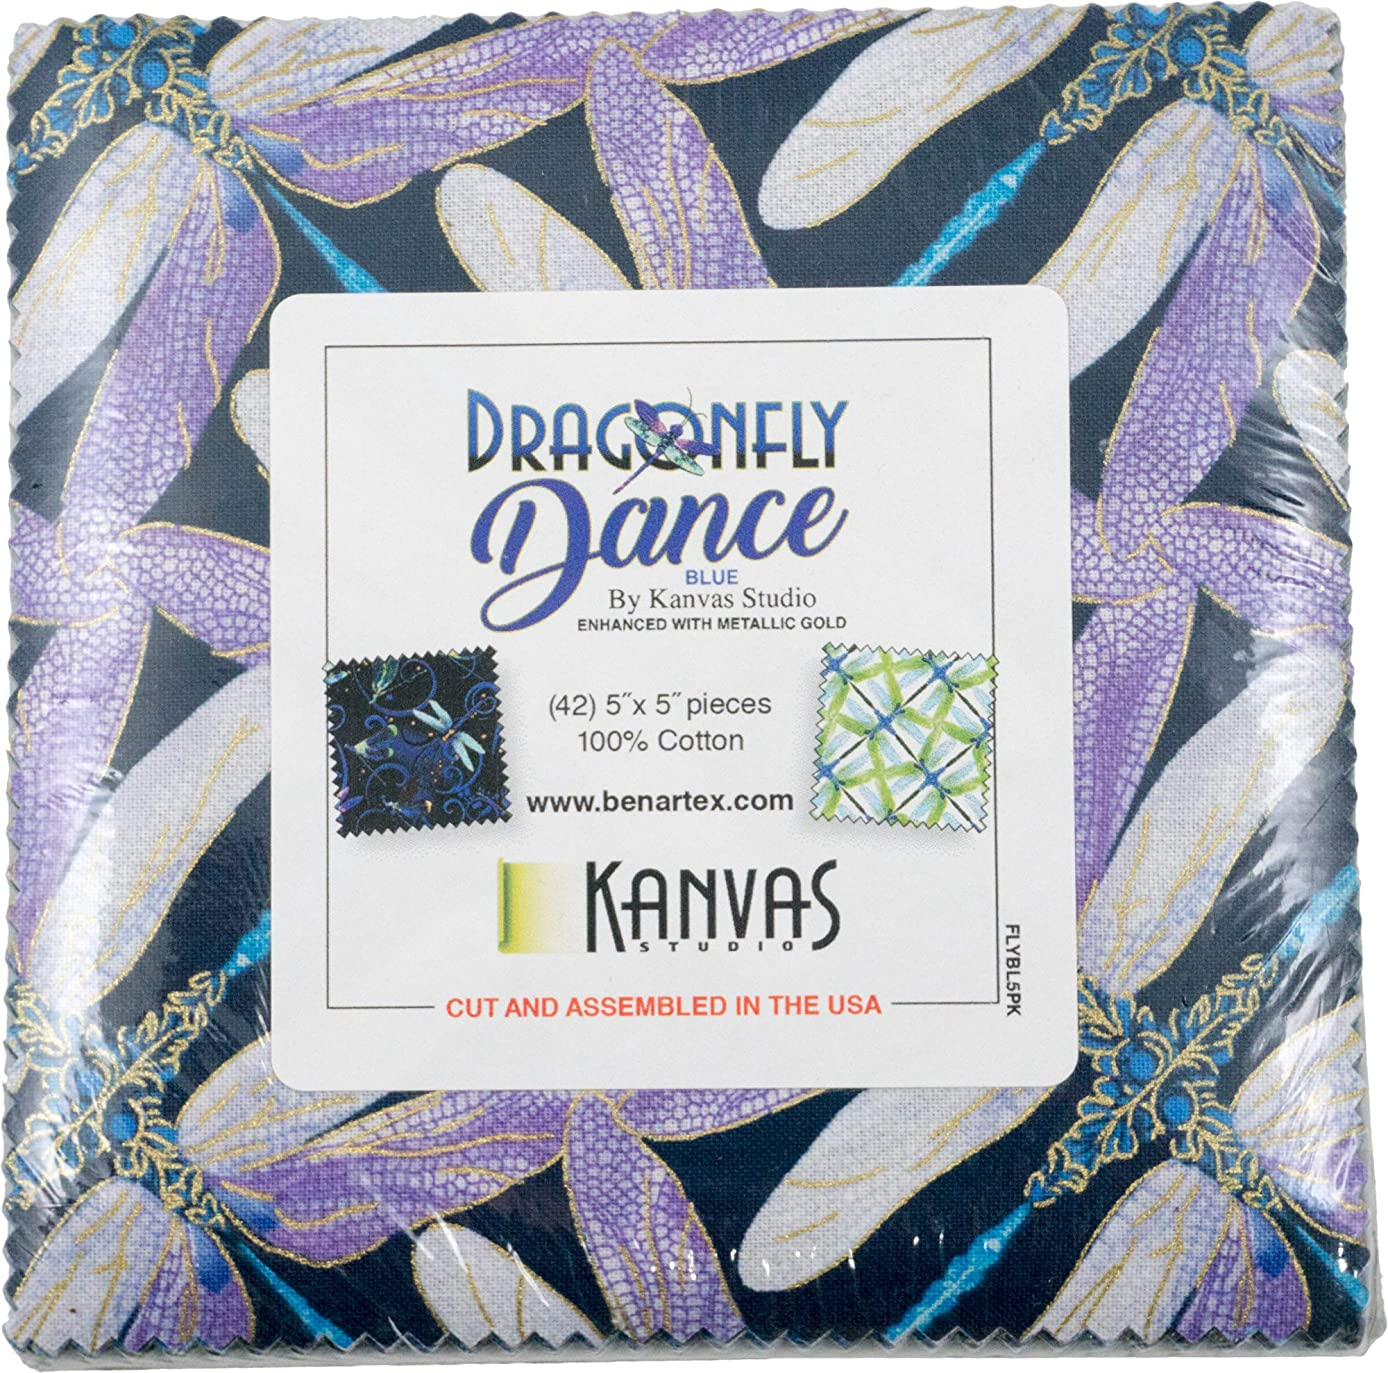 Kanvas Studio Dragonfly Dance Blue 5X5 Pack 42 5-inch Squares Charm Pack Benartex, Assorted